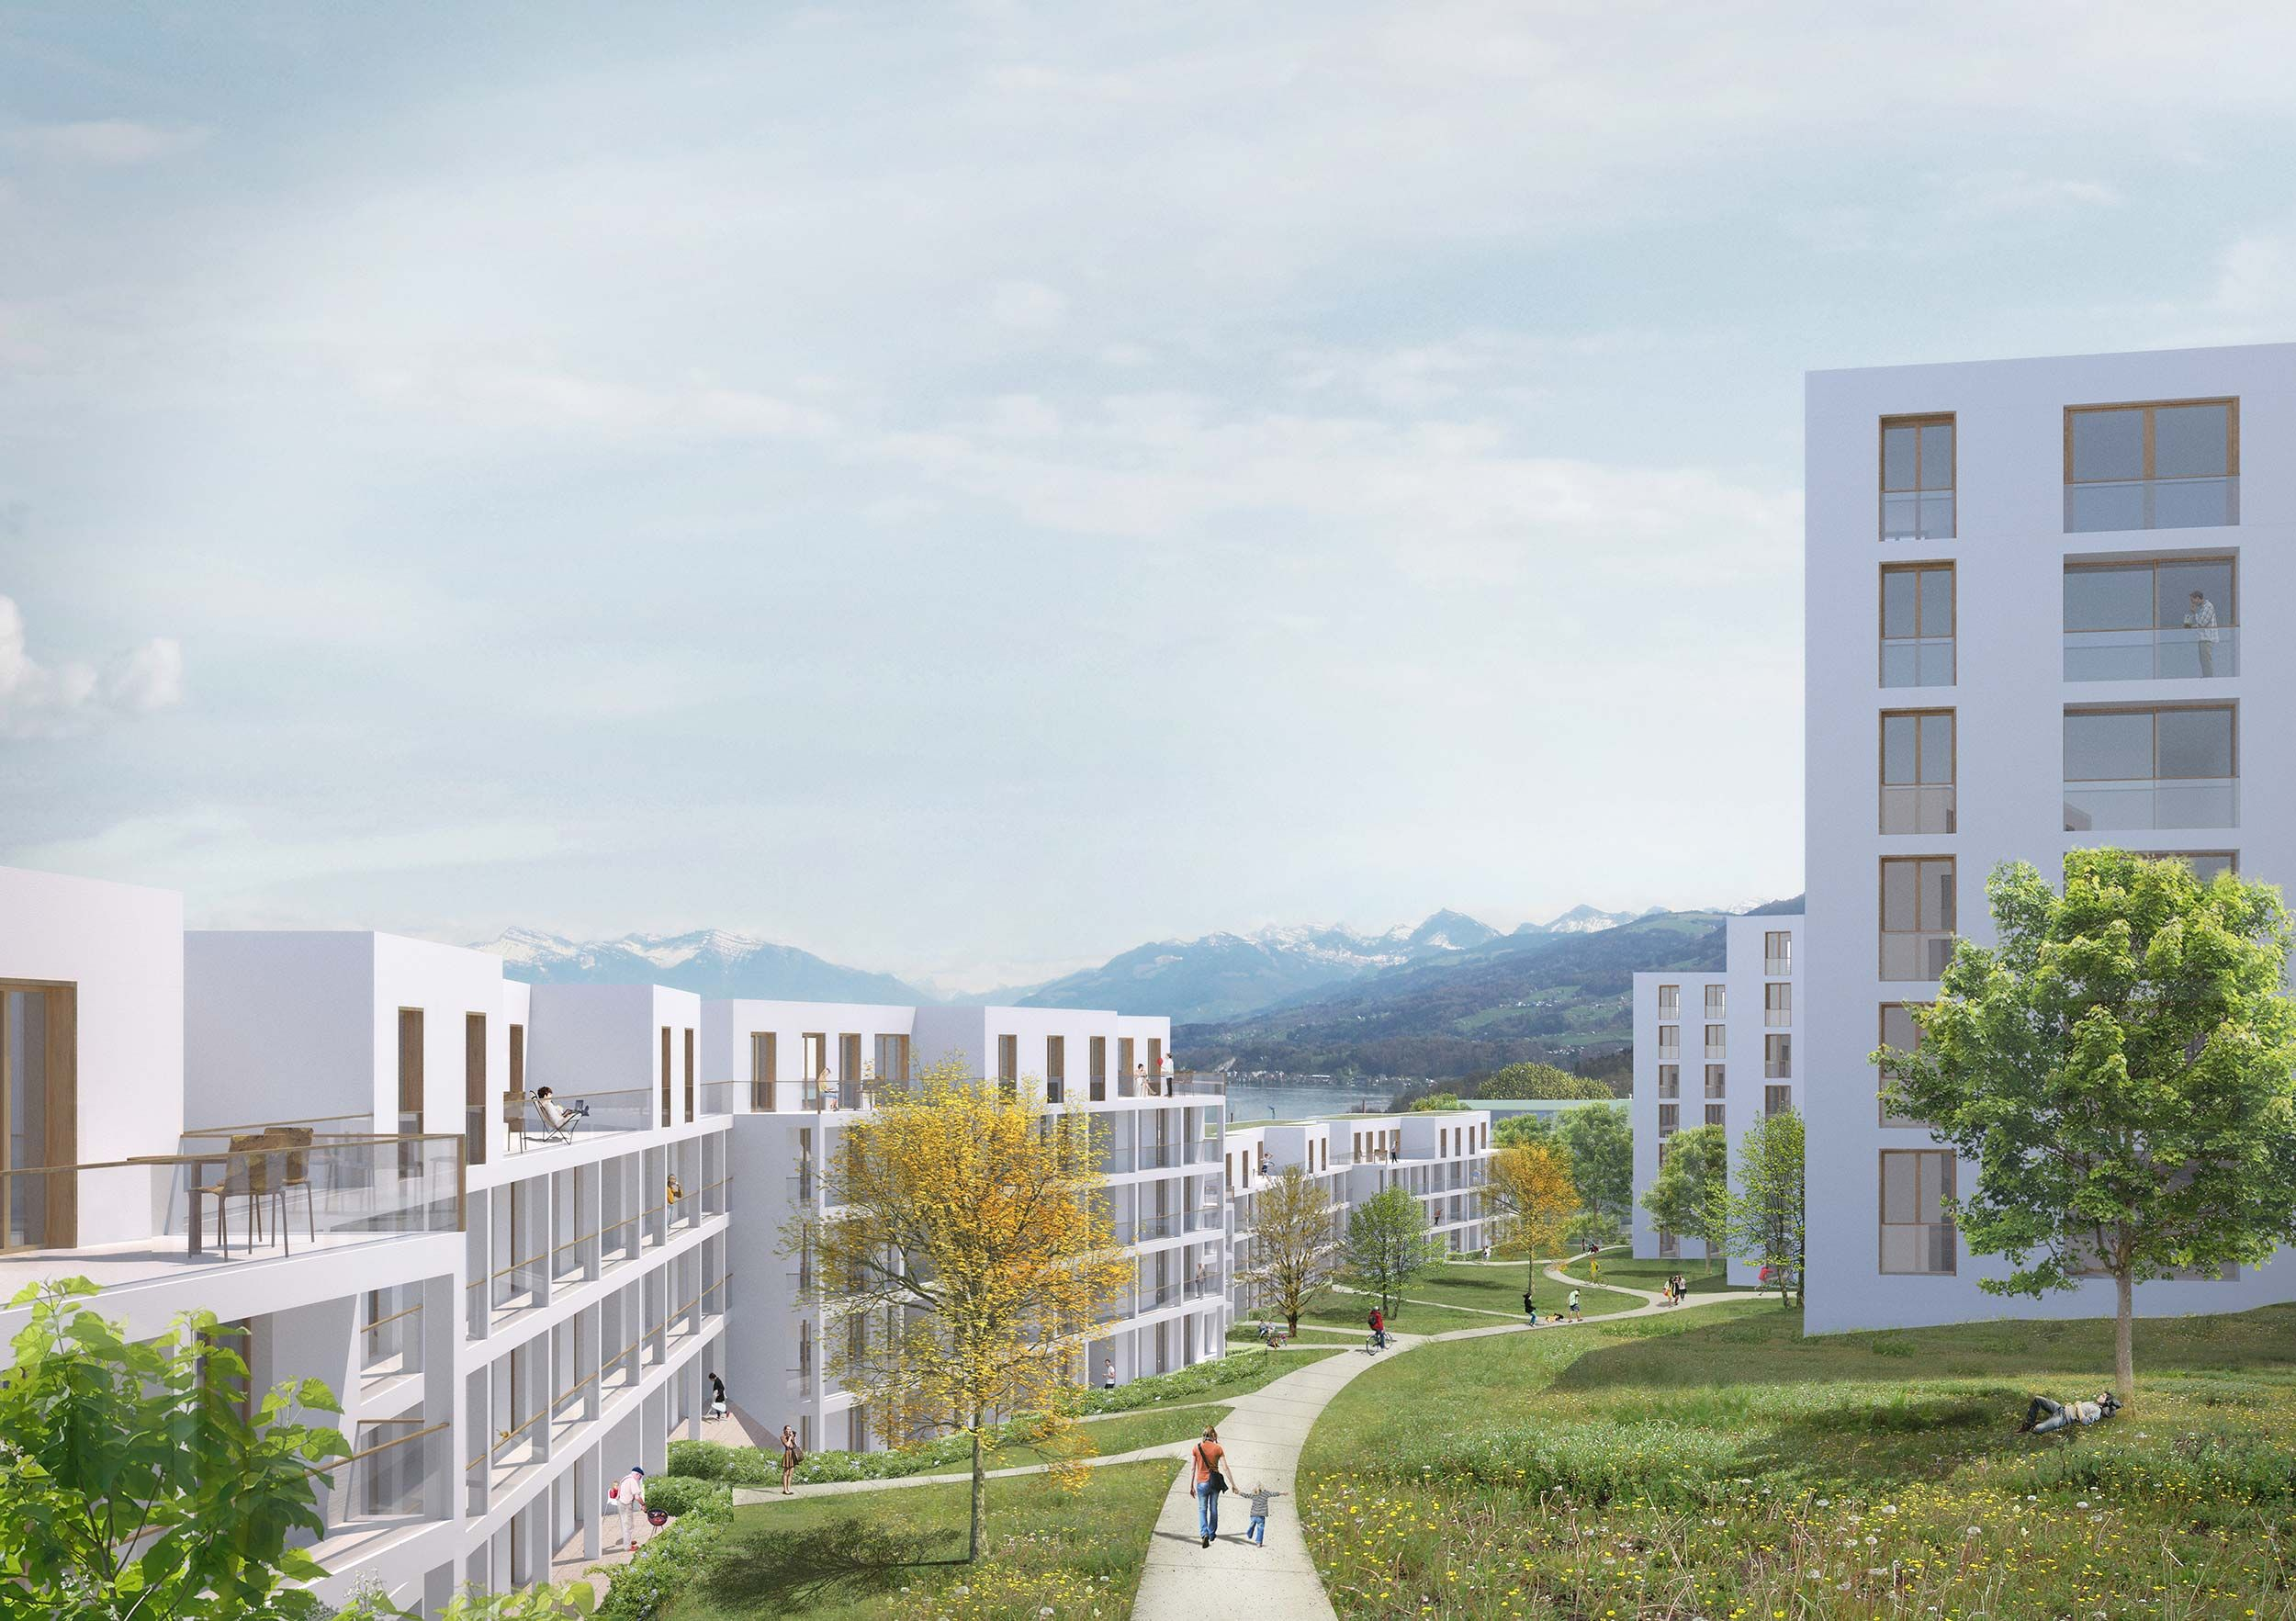 Replacement of Hangenmoos Housing Estate